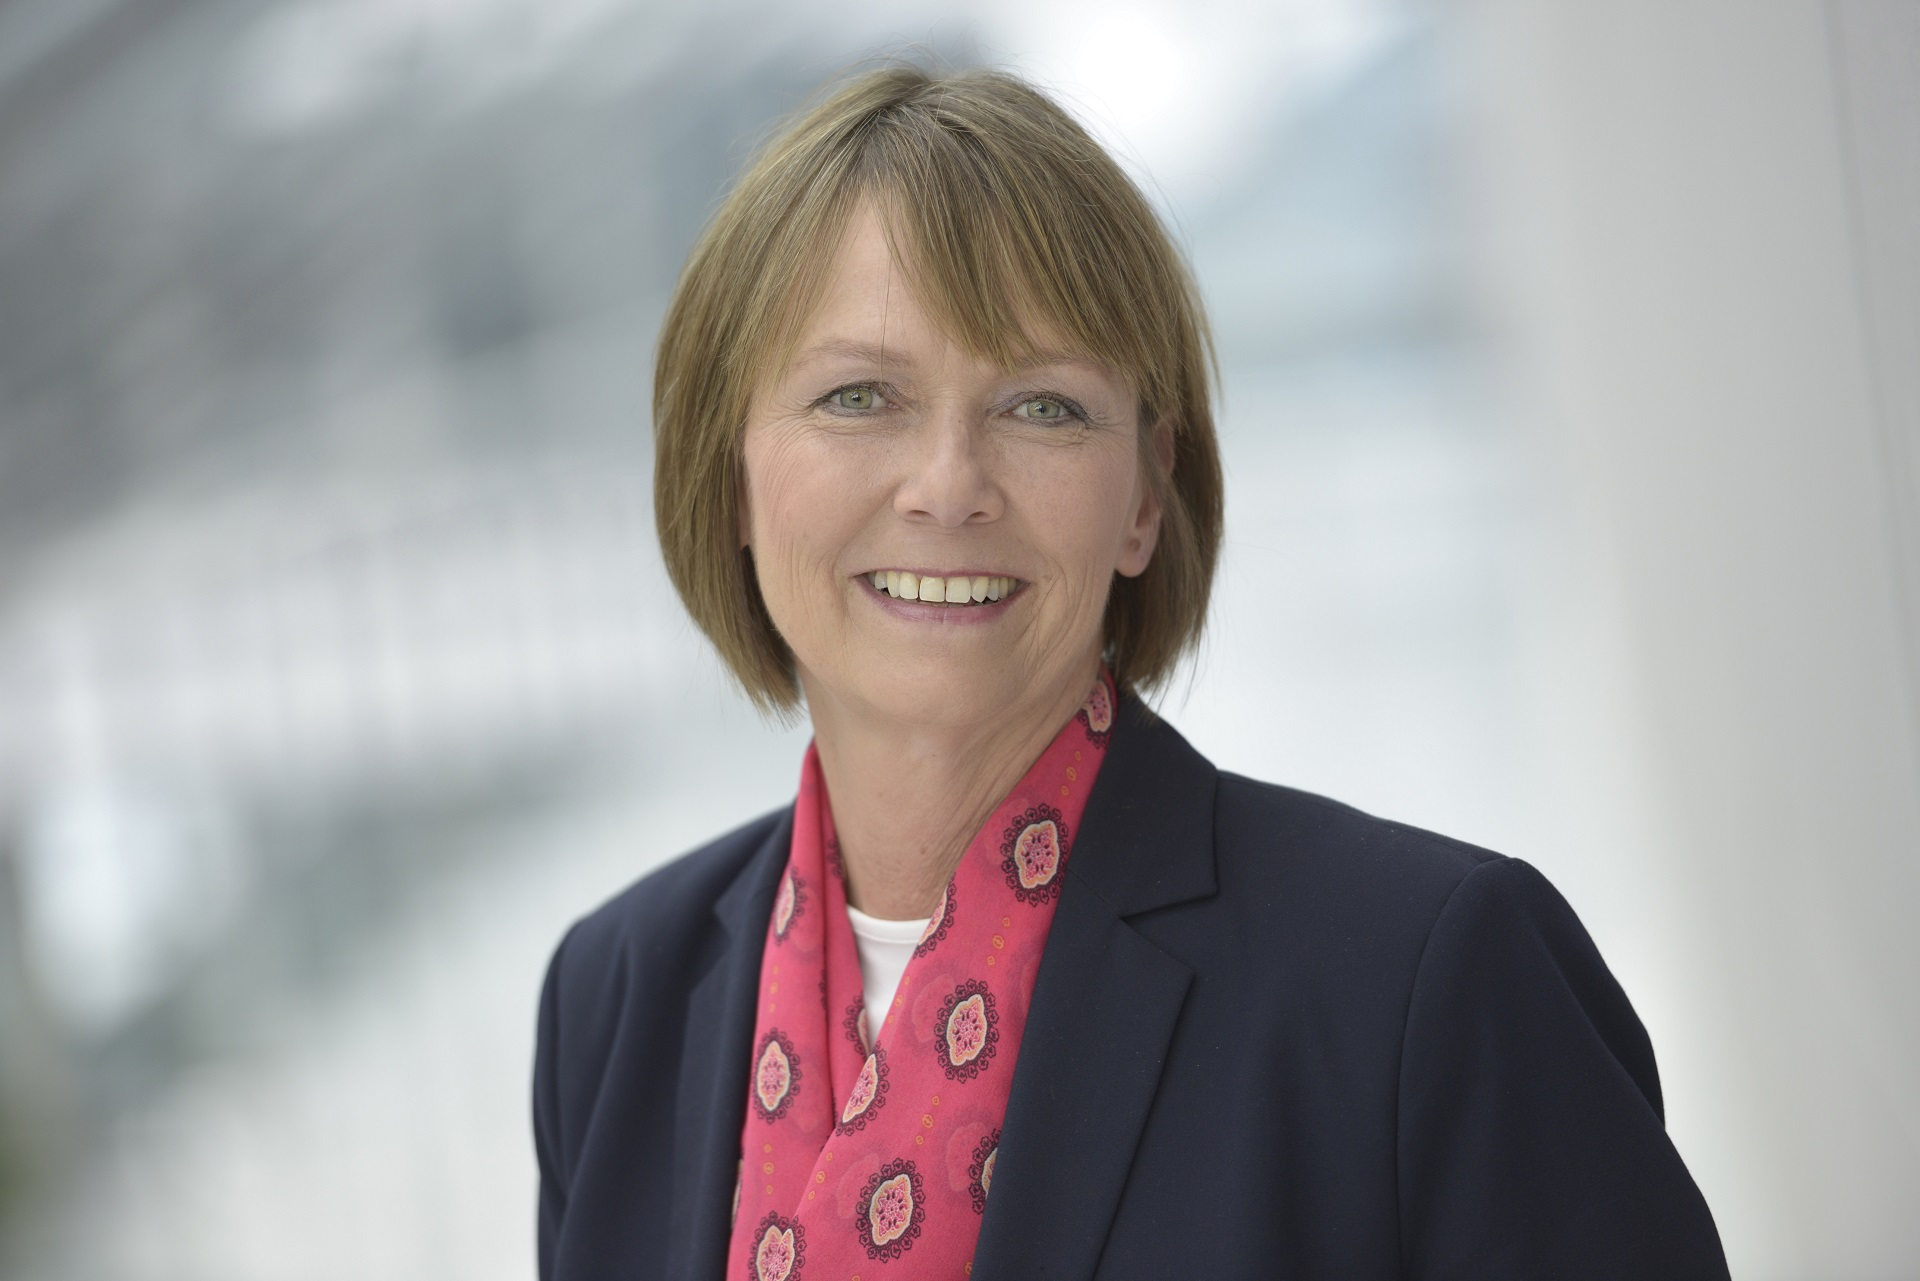 Bürgermeisterin Silvia Nieber (SPD)©Hansestadt Stade